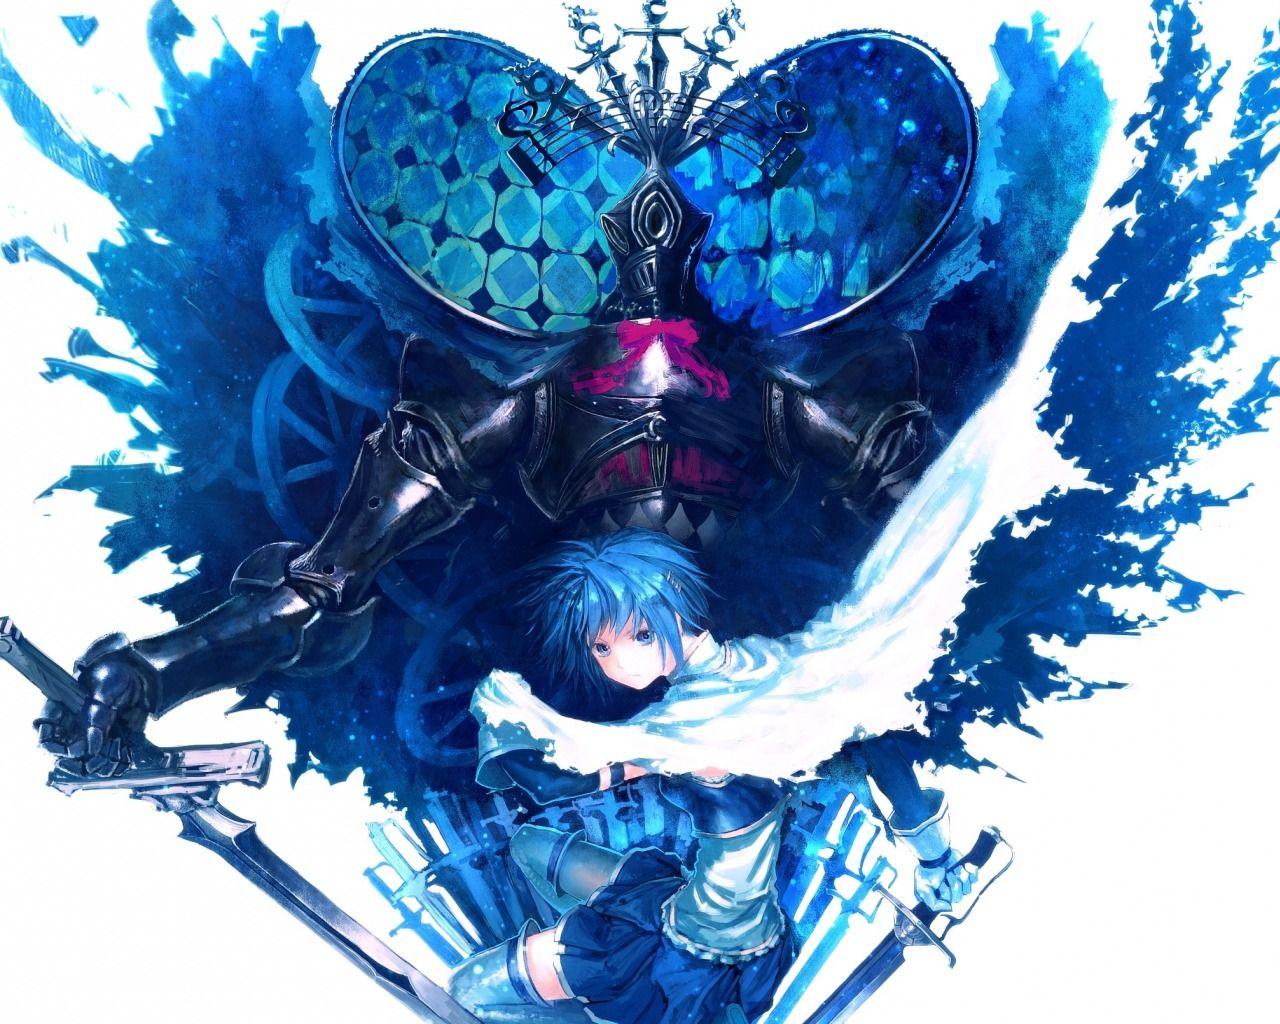 Download wallpaper art, lain, anime witch girl madoka